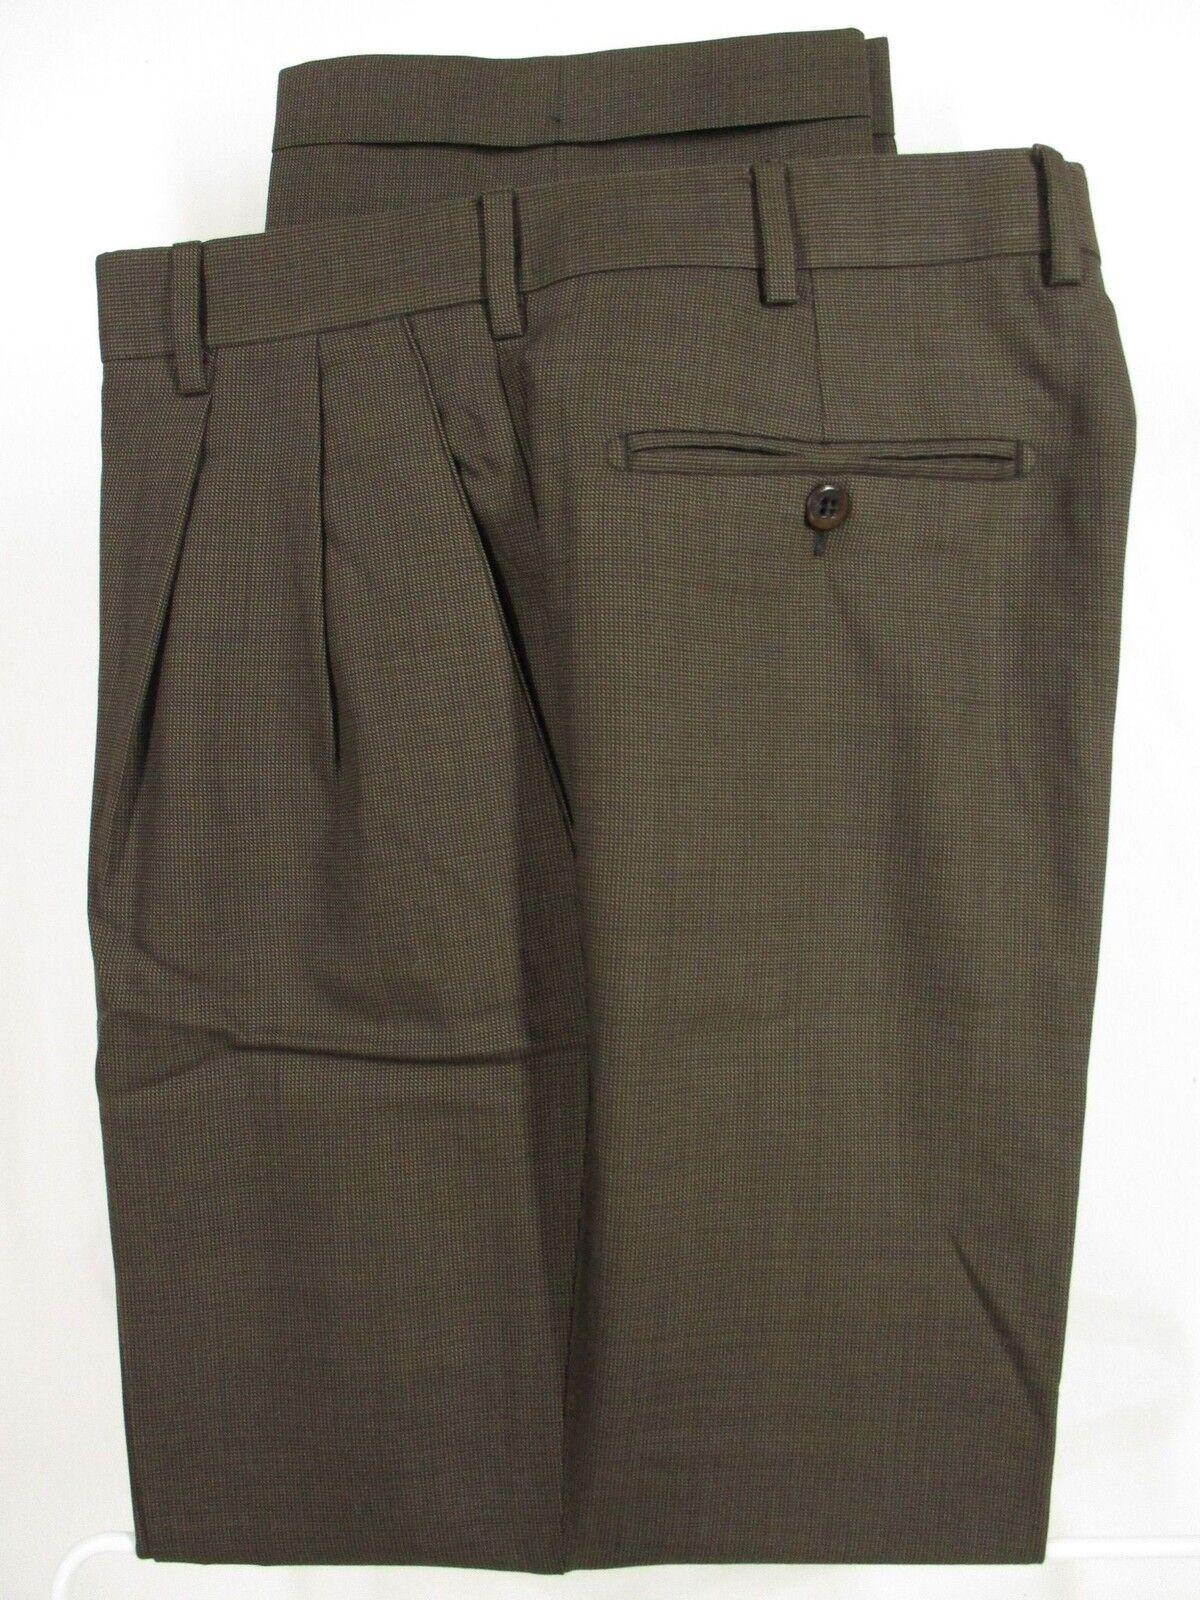 Zanella Bennett Mens Brown Pleated Wool Dress Pants Size 35 34x29